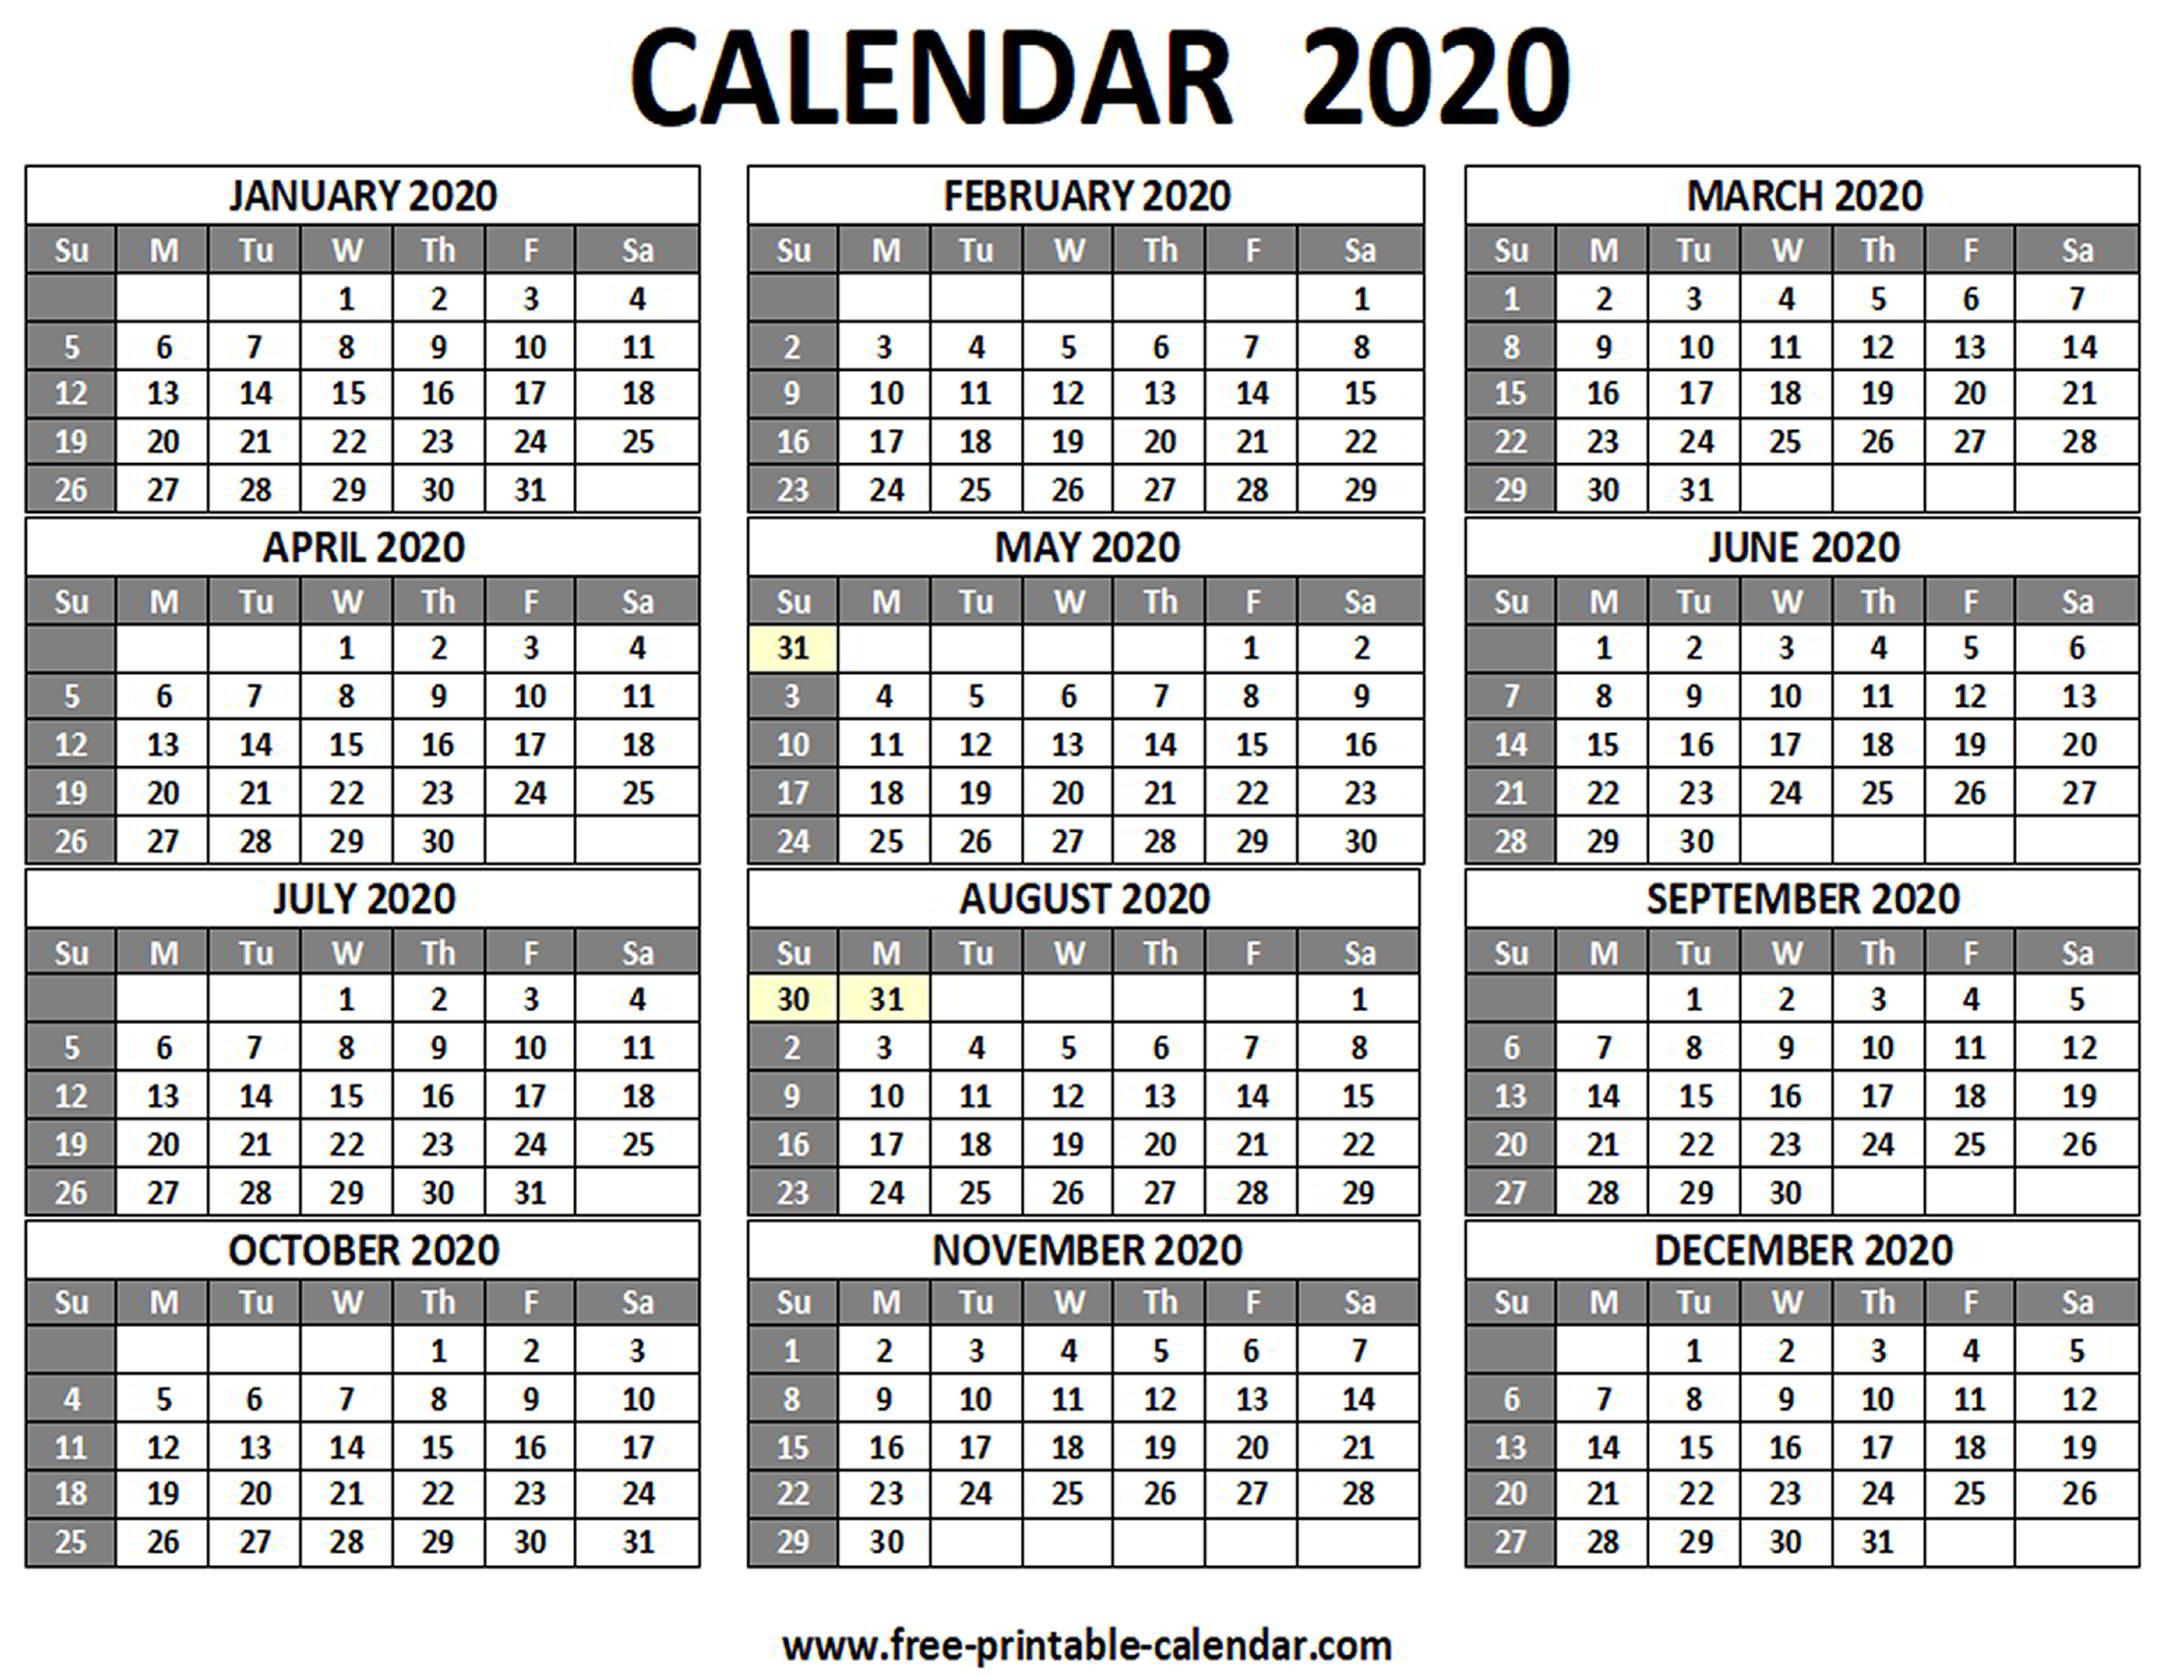 Printable 2020 Calendar - Free-Printable-Calendar within 2020 Printable Calendar Sunday To Saturday